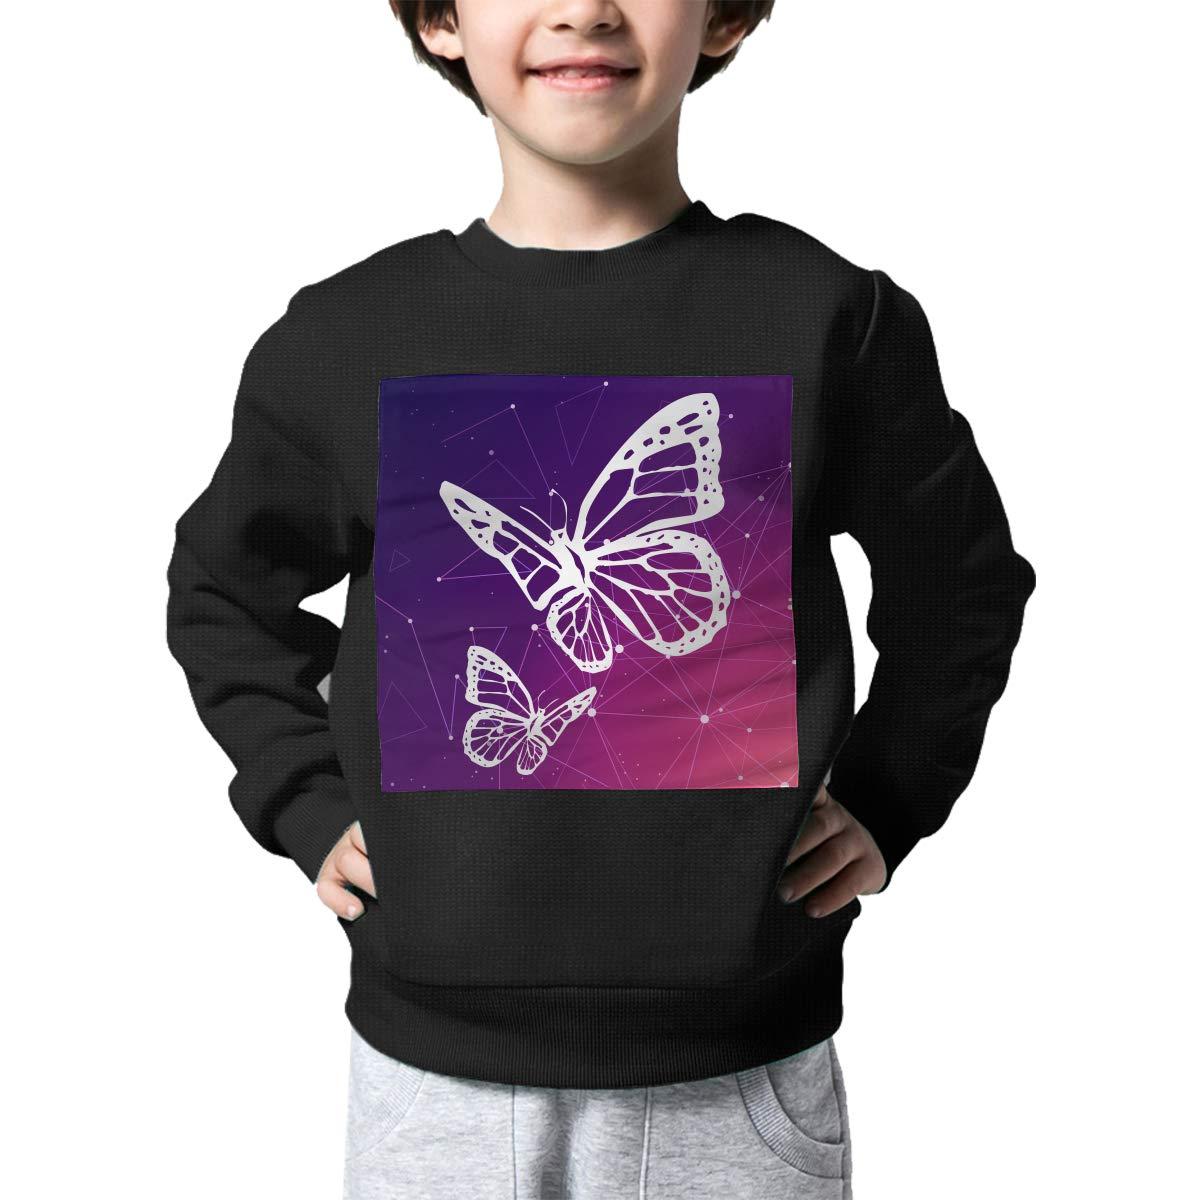 Monarch Butterfly Print Baby Girls Childrens Crew Neck Sweater Long Sleeve Cute Knit Sweatshirt